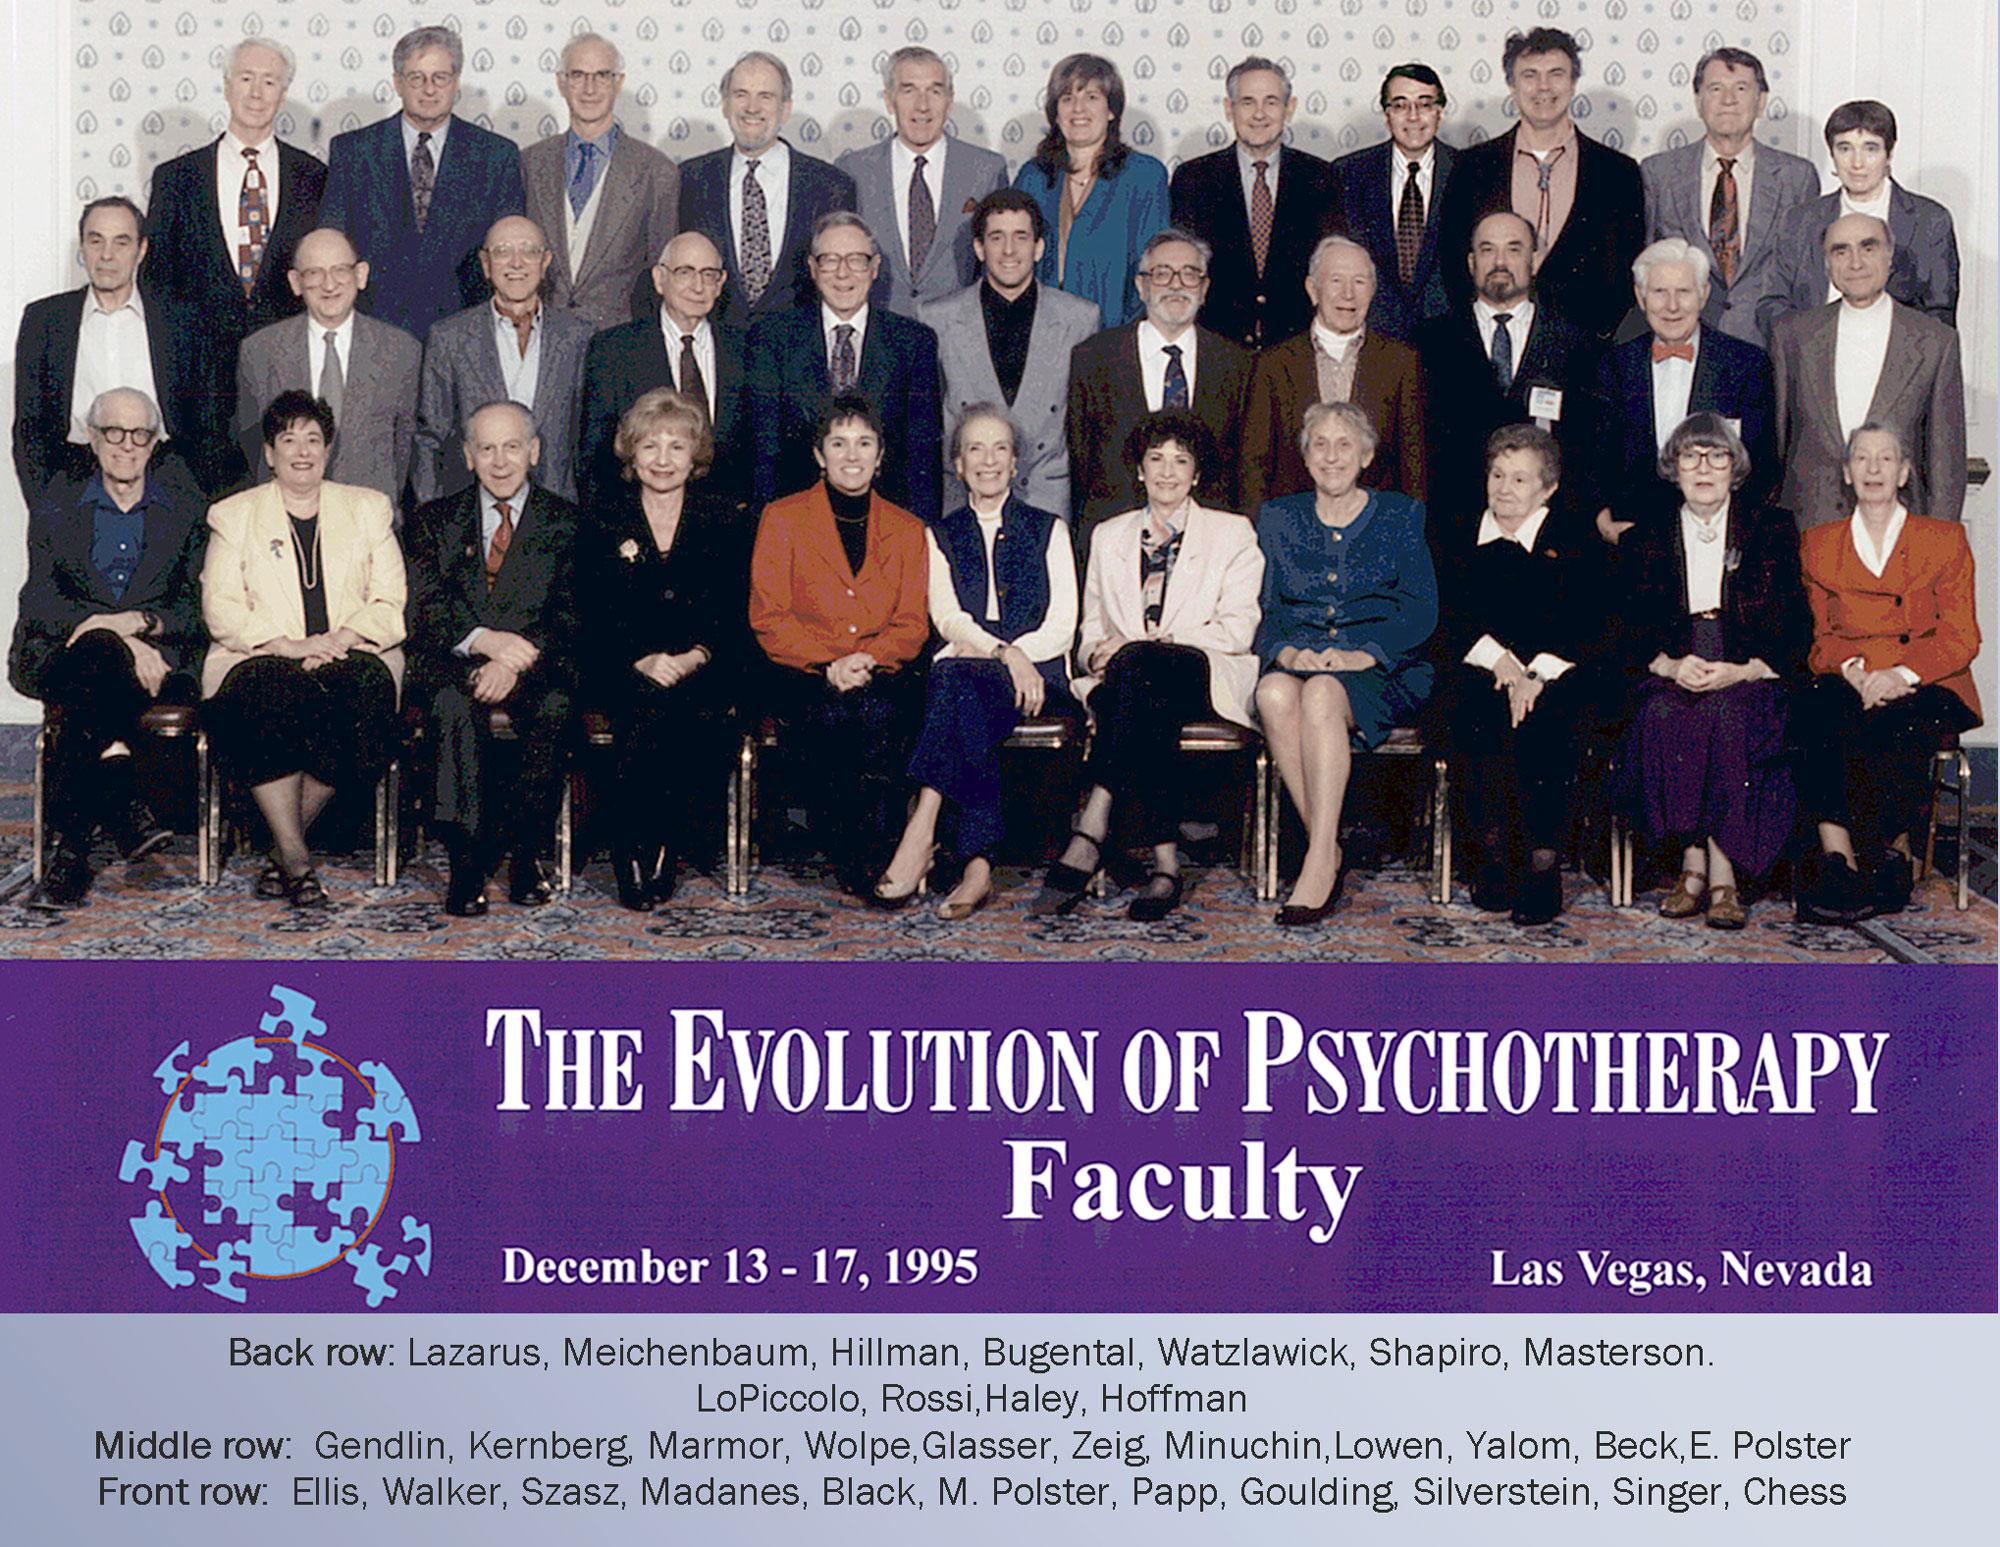 Evolution 1995 Faculty Group Photo